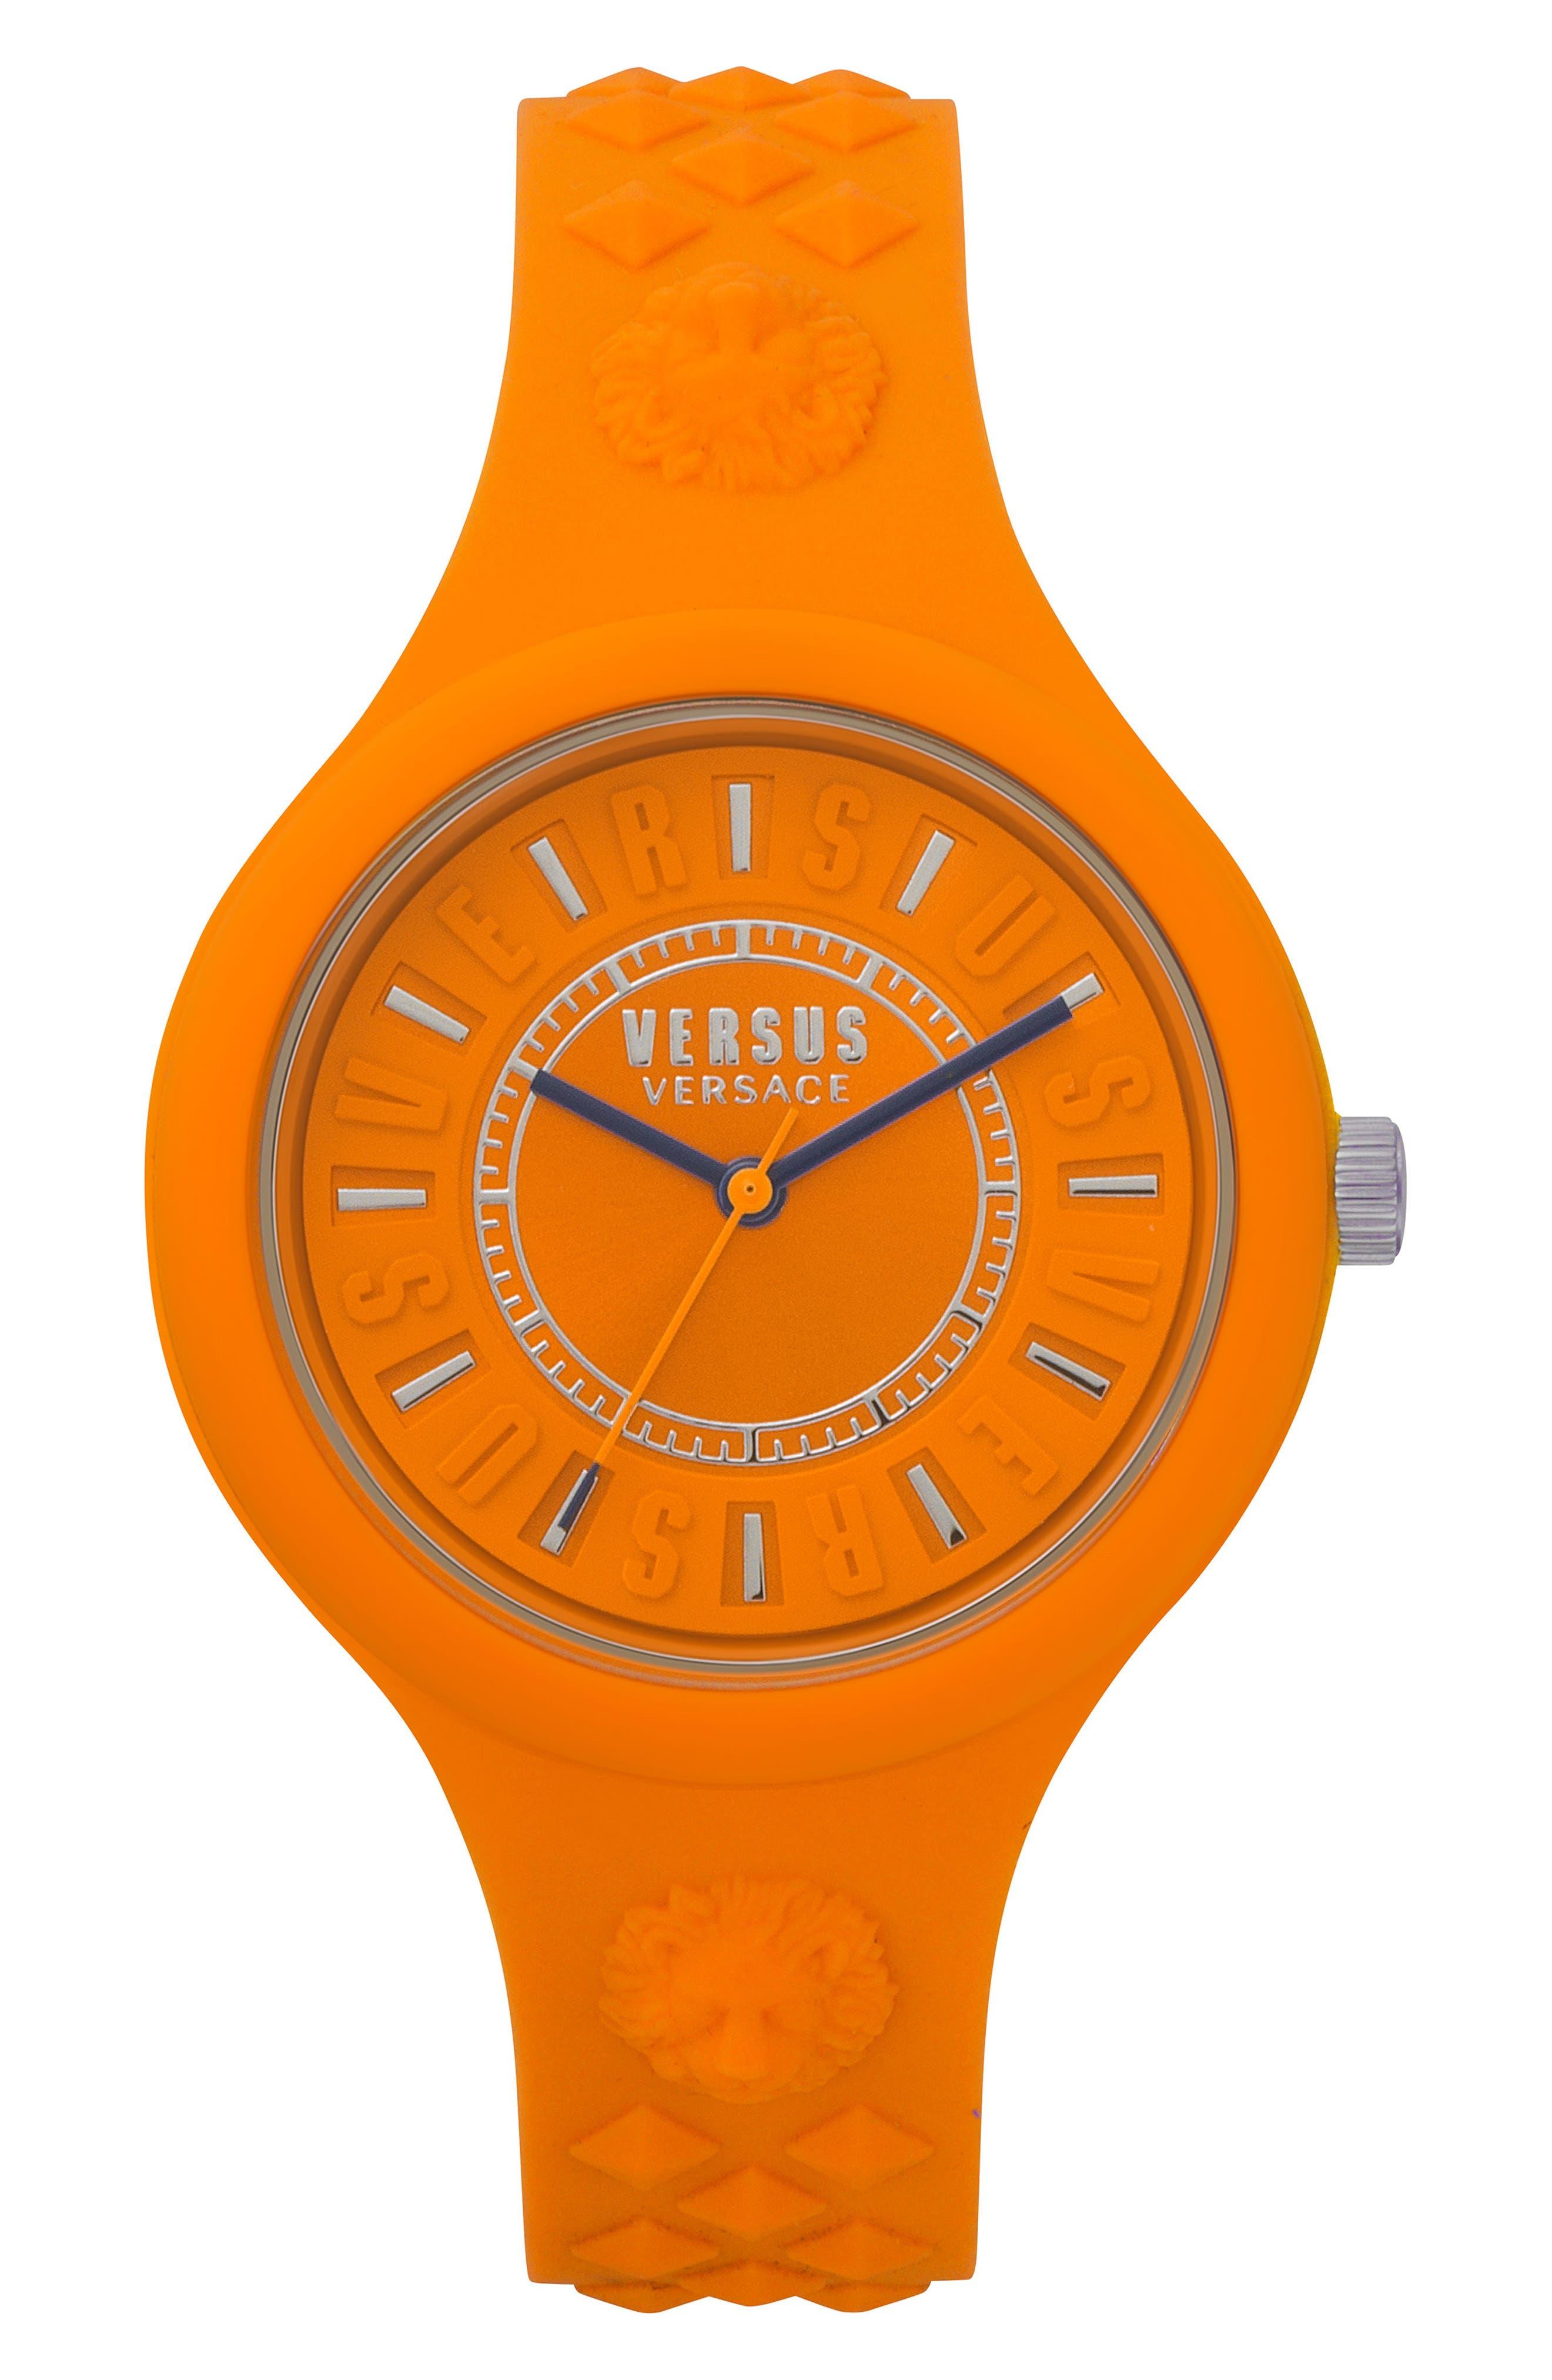 VERSUS VERSACE Fire Island Silicone Strap Watch, 39mm, Main, color, ORANGE/ GREY